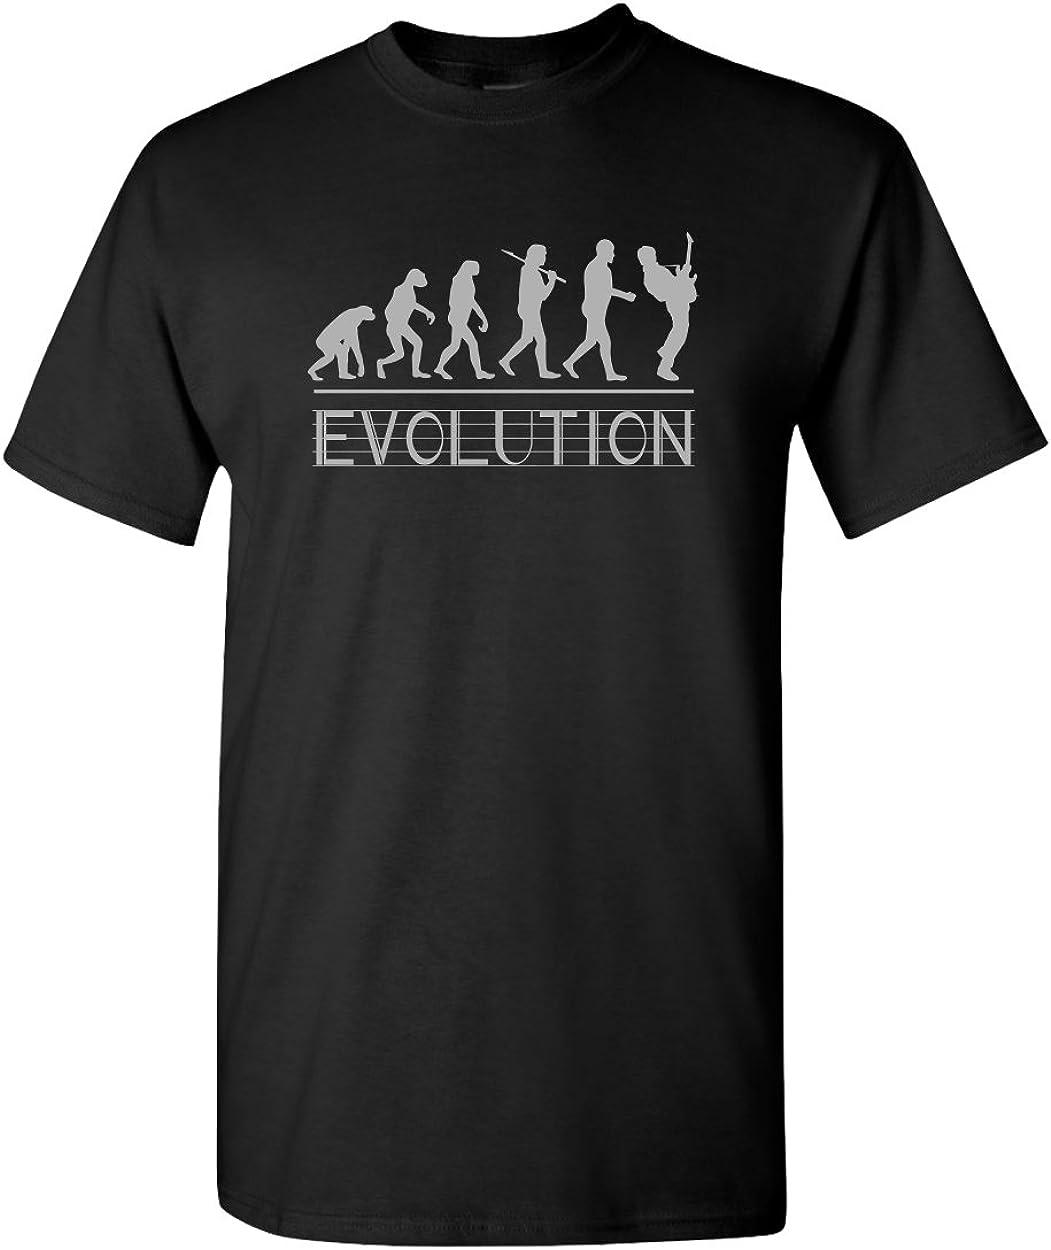 Bassist Definition Mens T-Shirt Music Funny Gift Idea Rock Guitar Bass Band